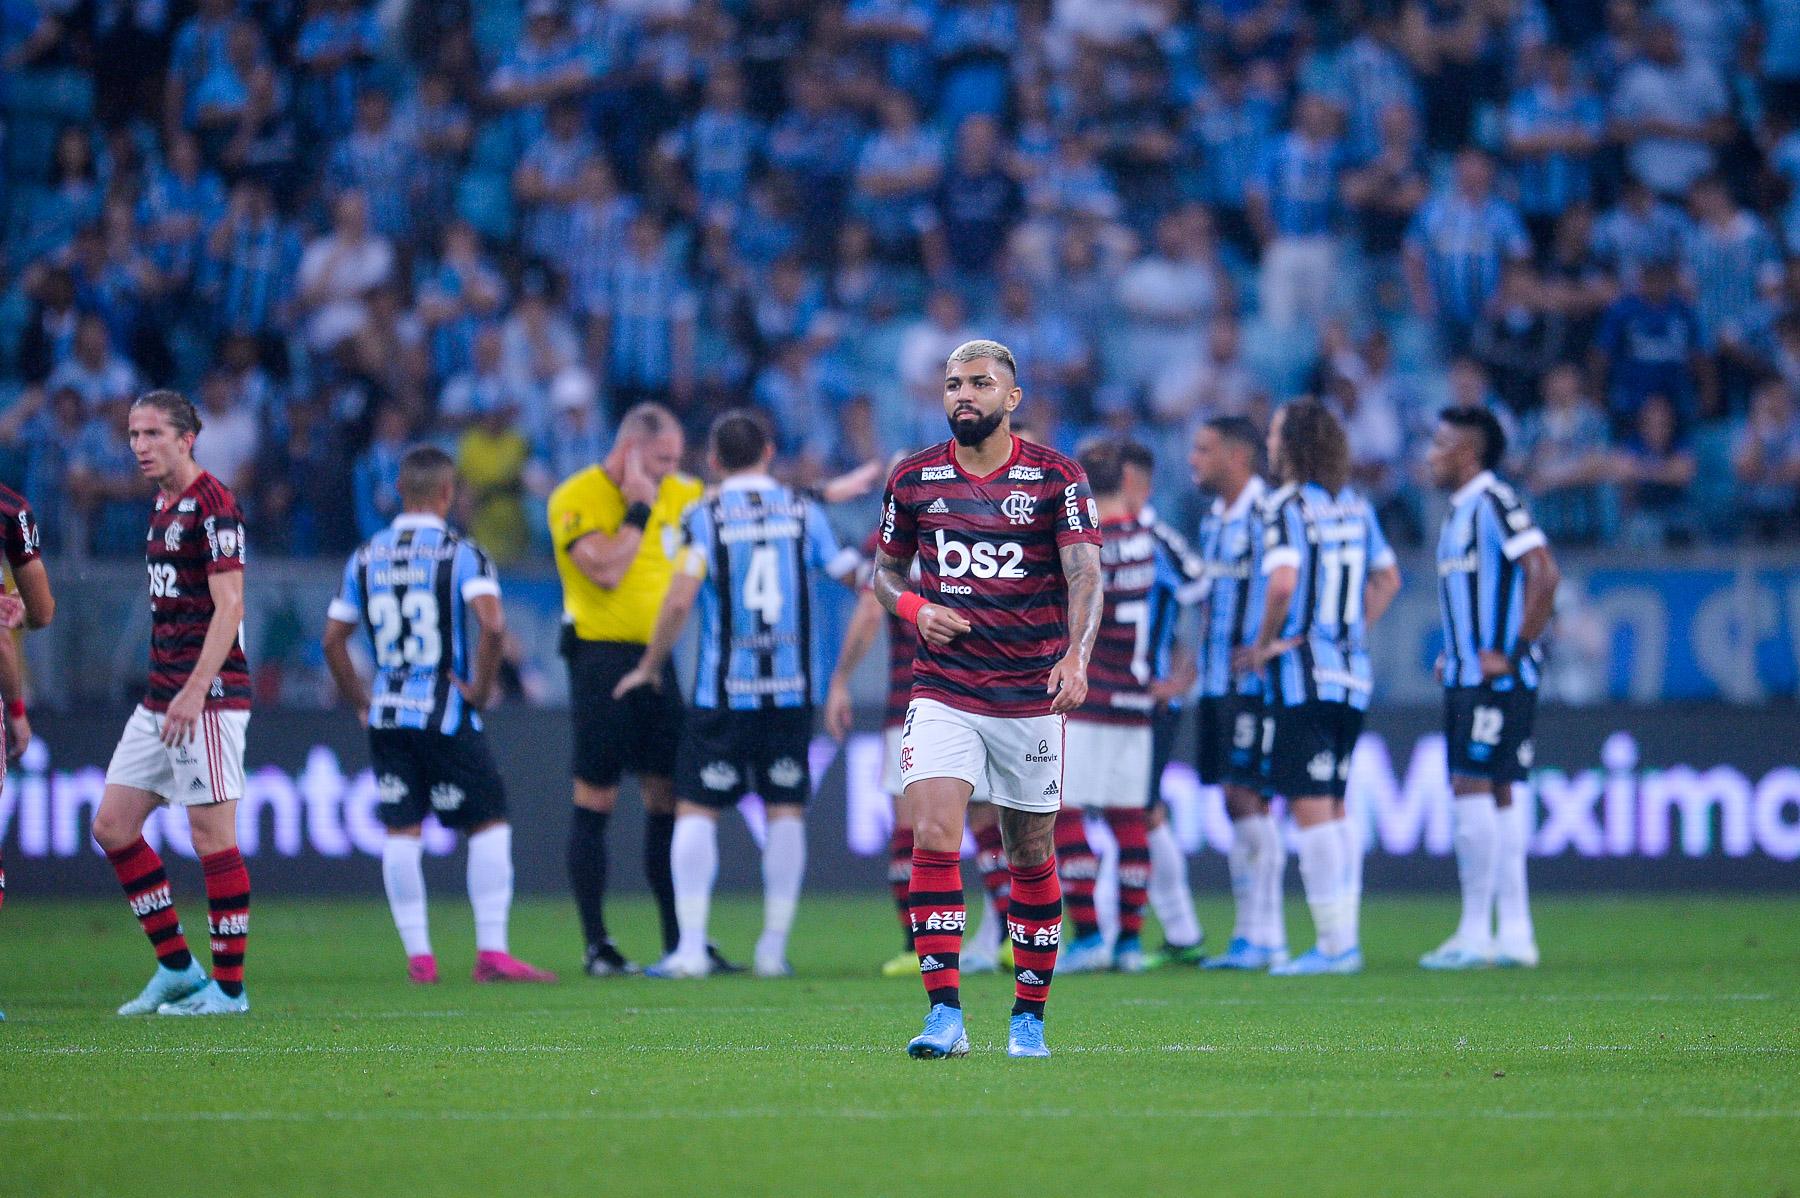 Gremio_X_Flamengo_dudabairros_Eleven_117